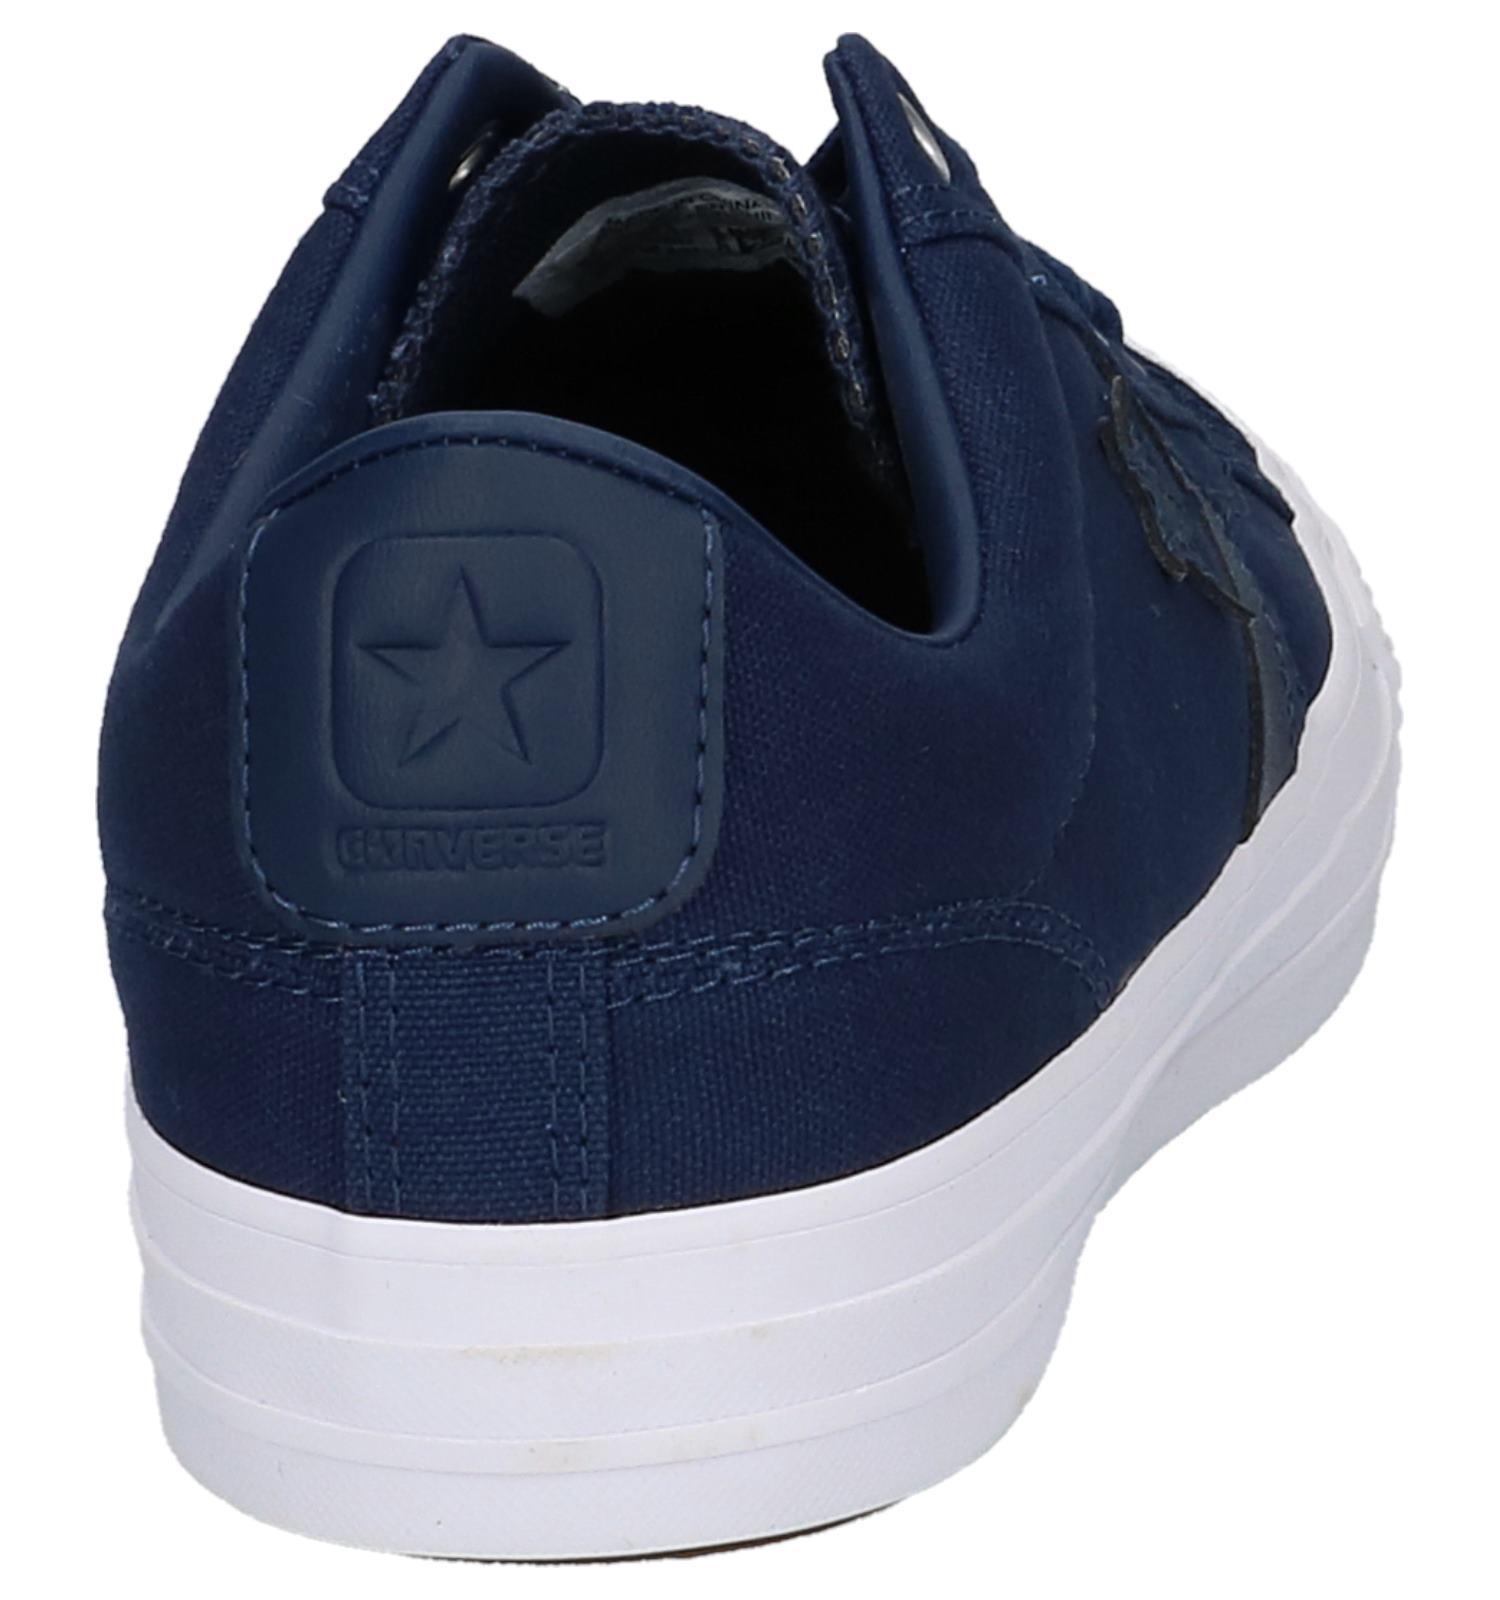 37b9e4c99e8 Donkerblauwe Lage Sportieve Sneakers Converse Star Player Ox | TORFS.BE |  Gratis verzend en retour